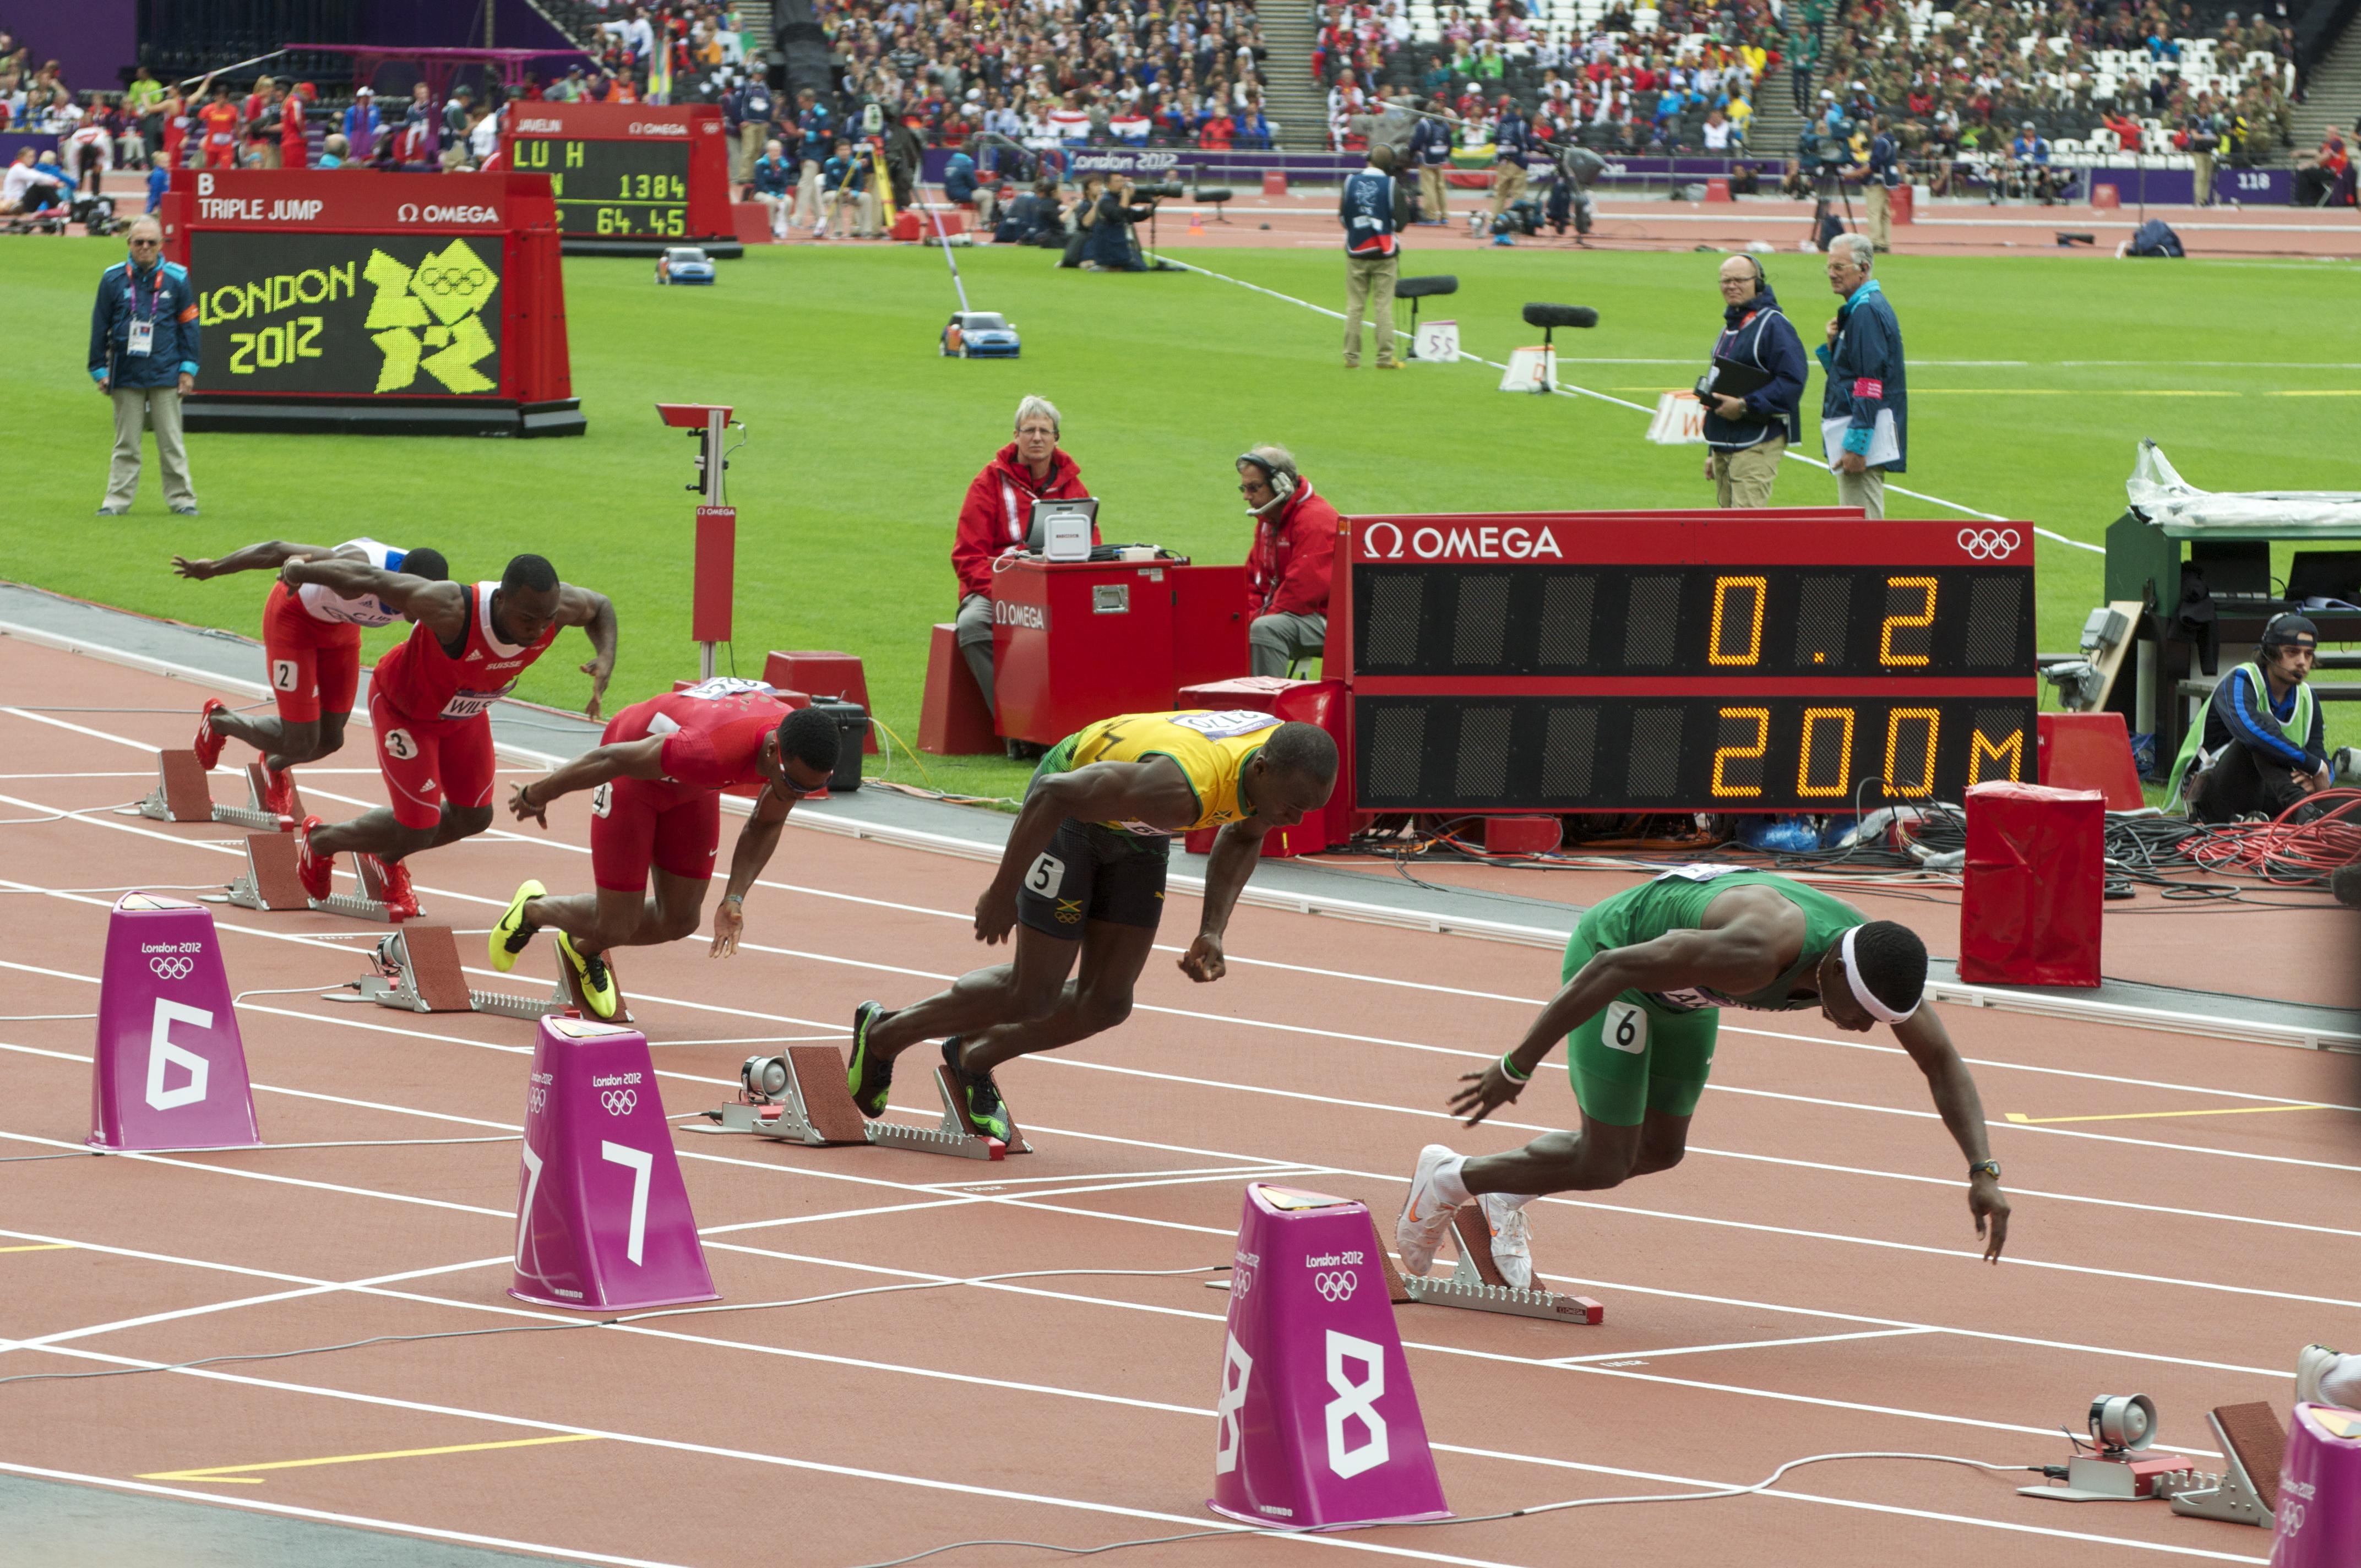 200 metres - Wikipedia